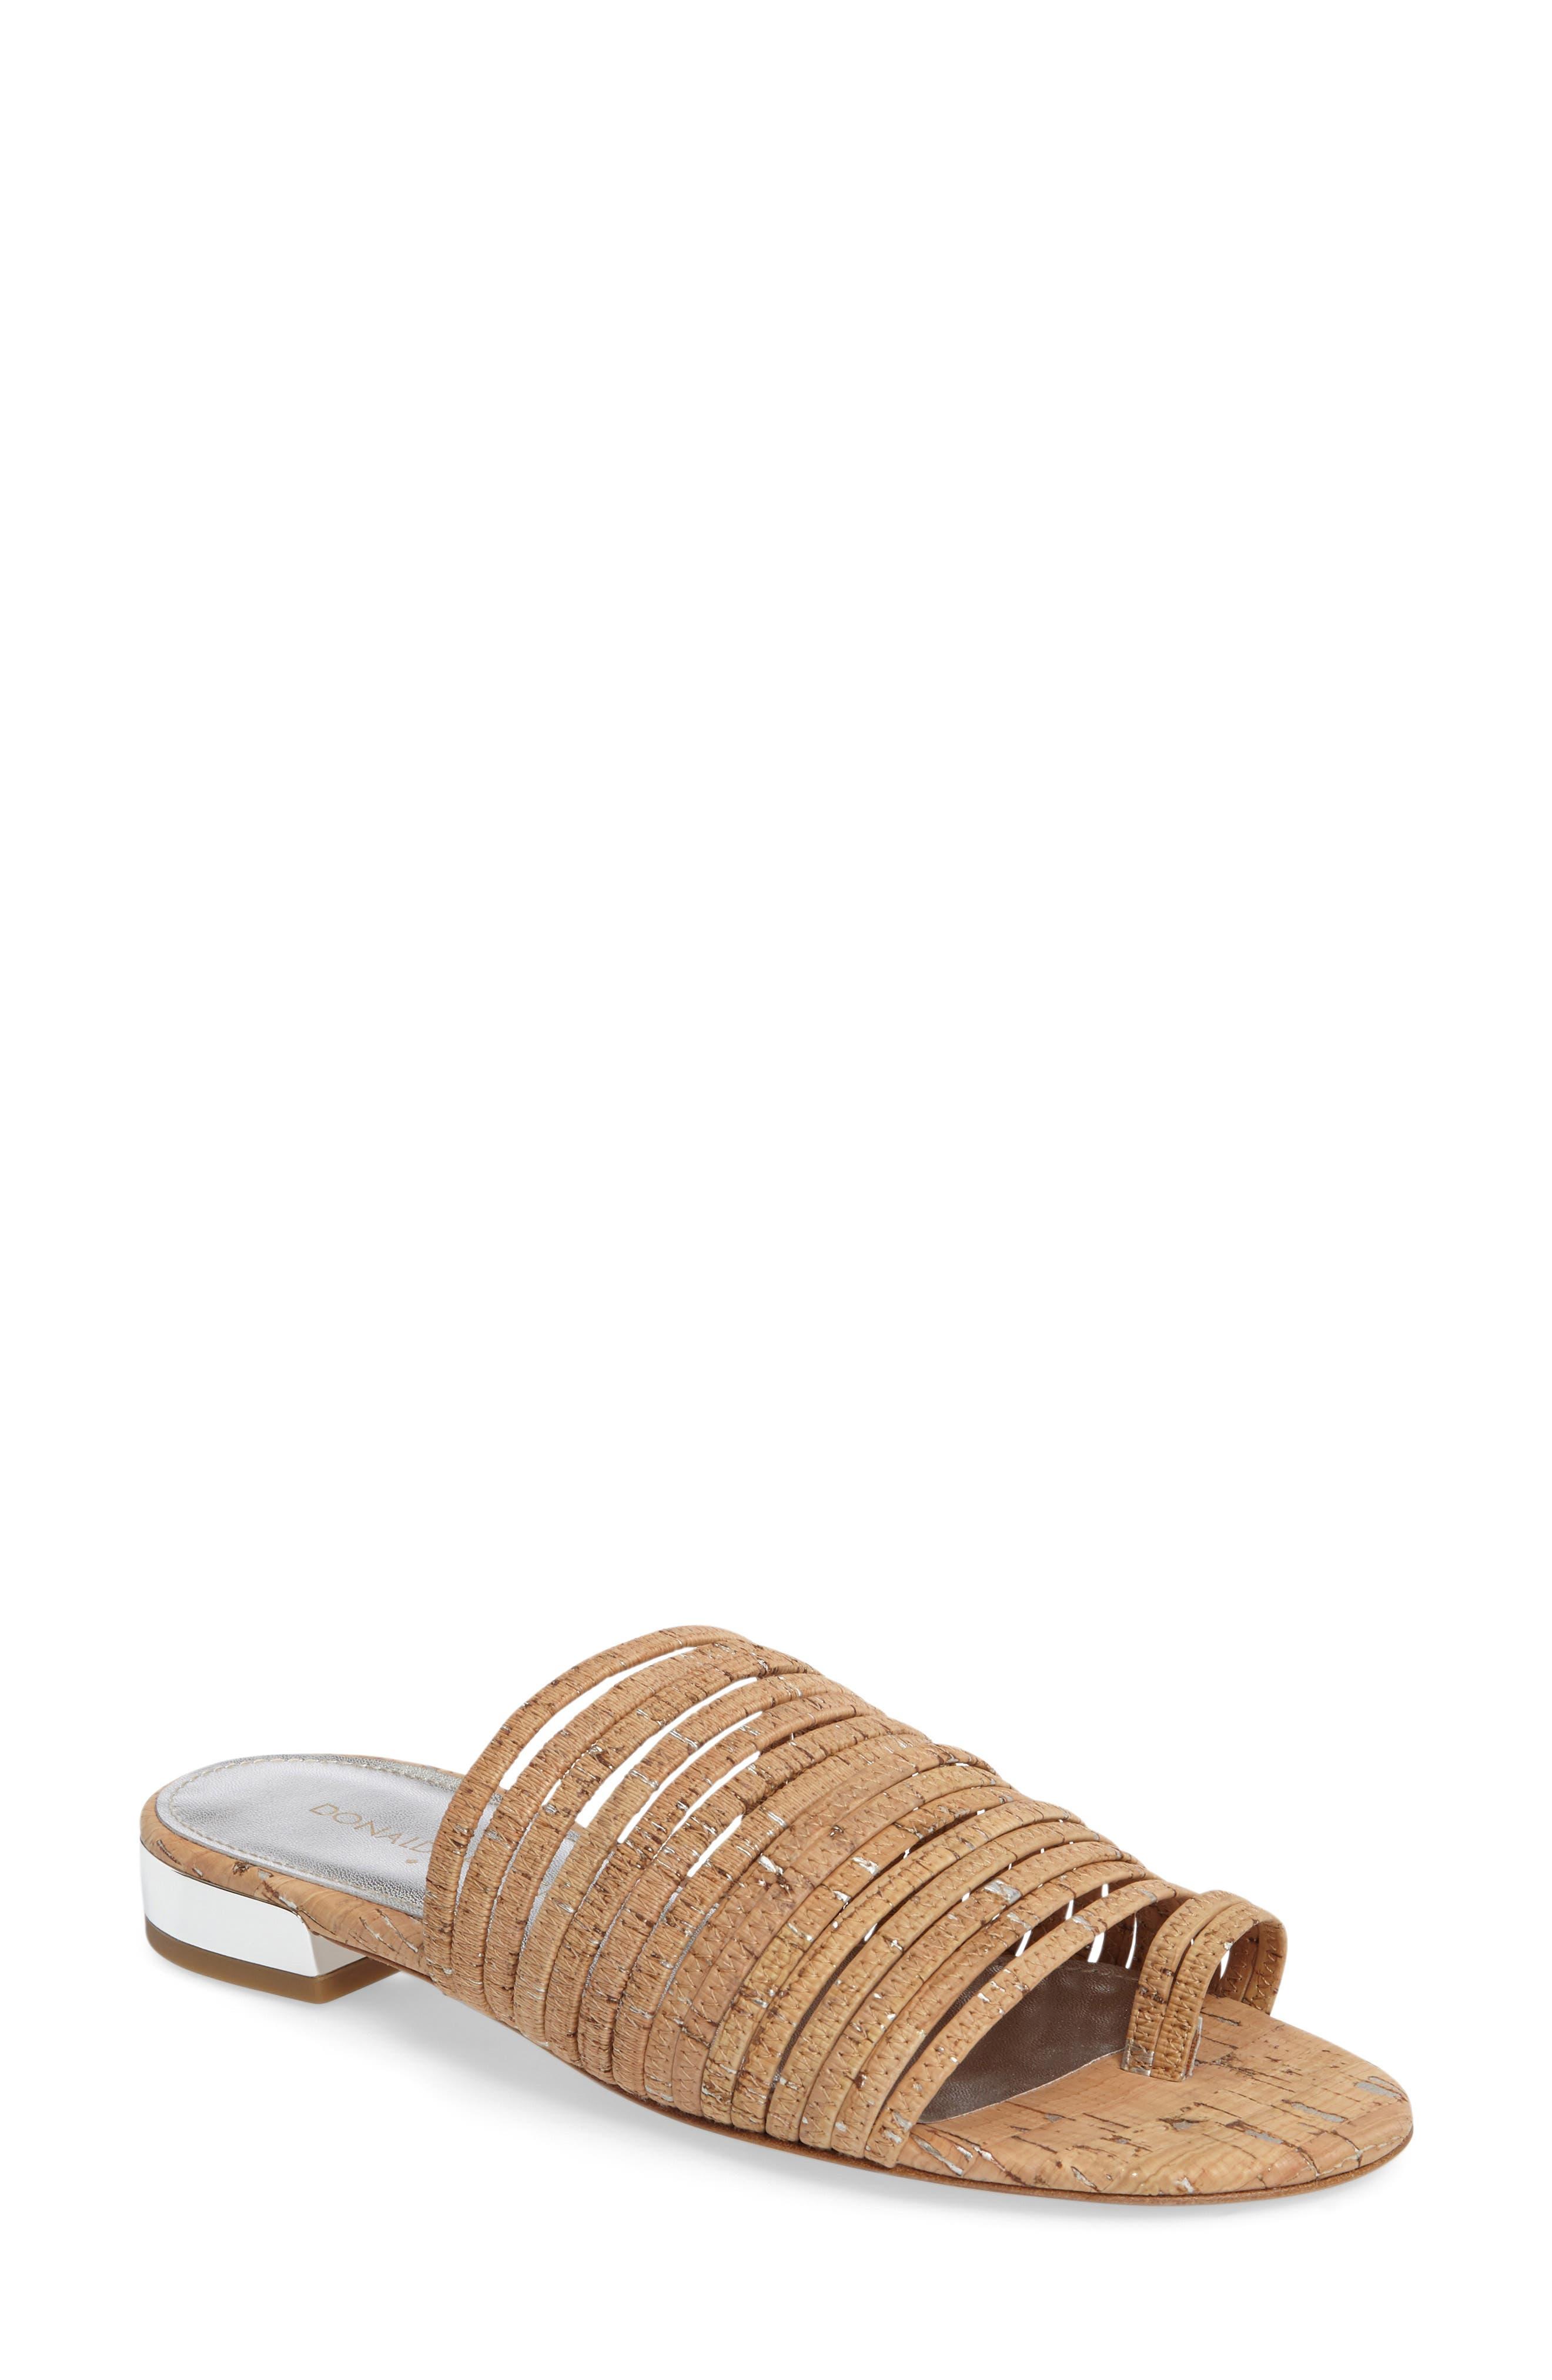 Frea Strappy Sandal,                         Main,                         color, Natural Cork